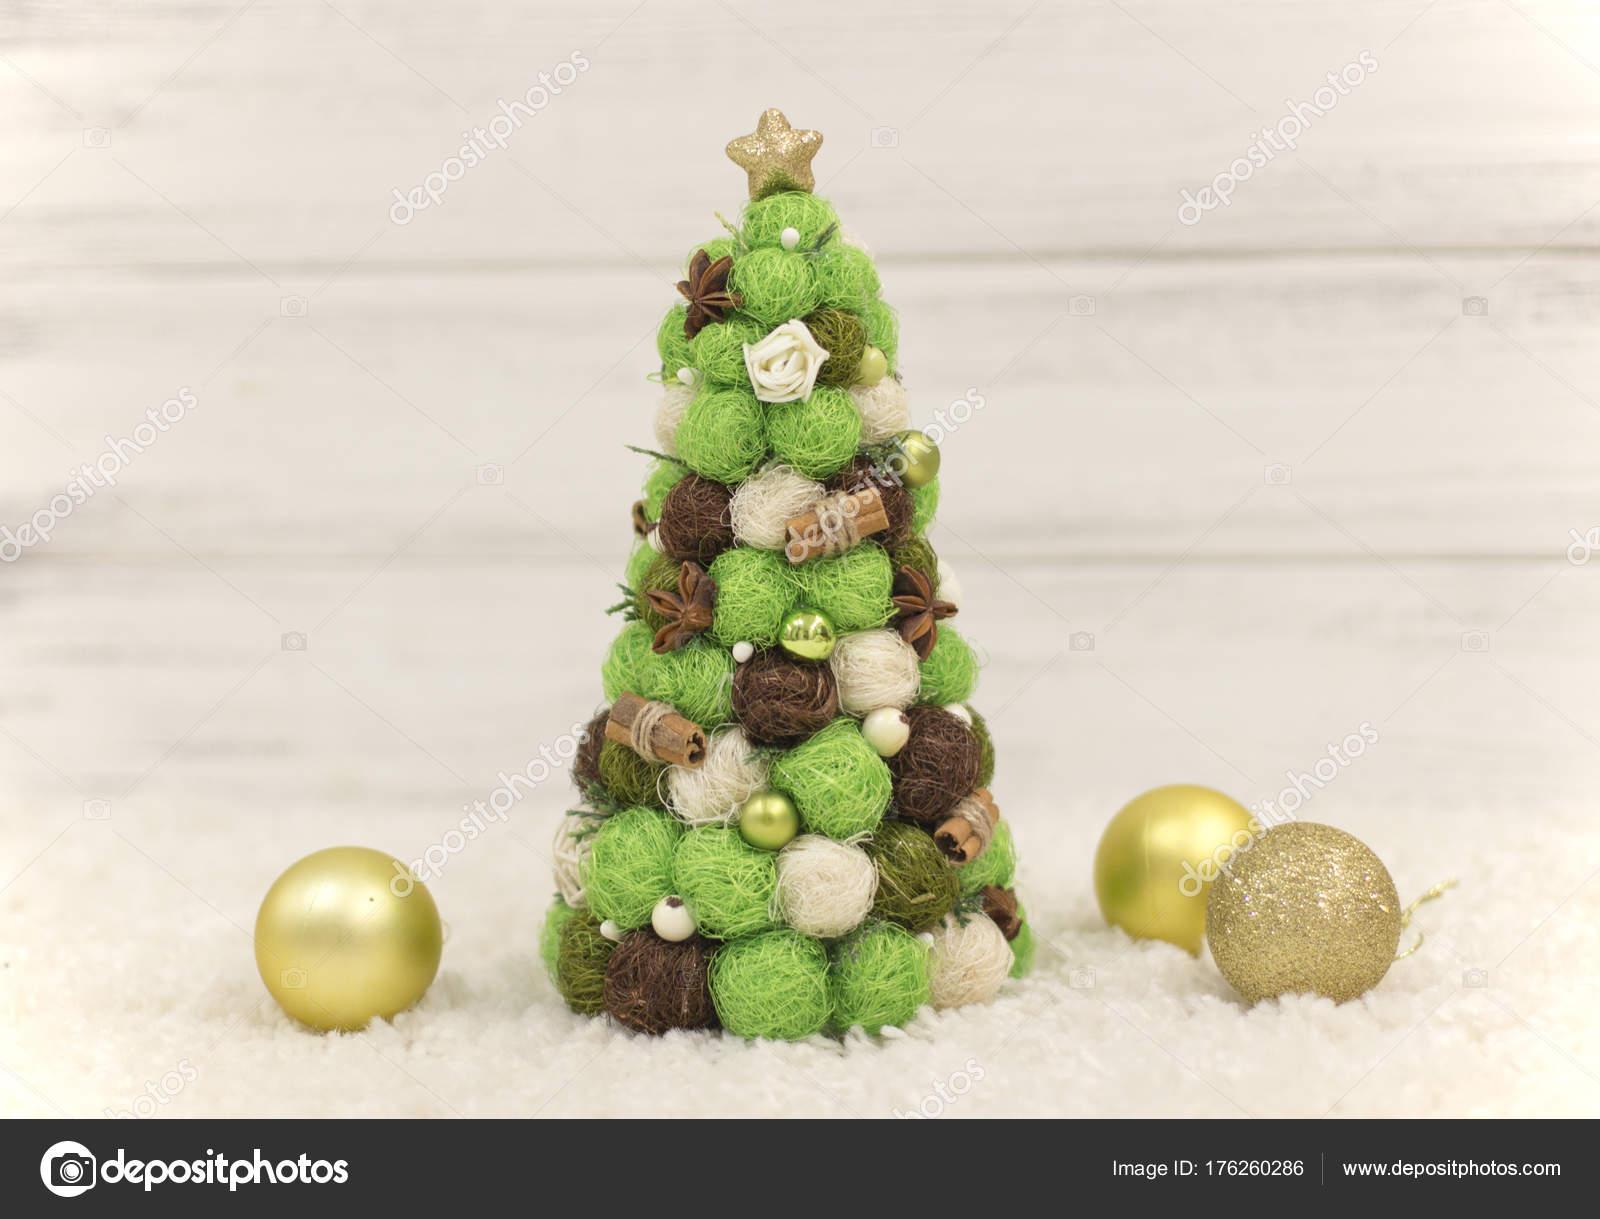 christmas tree decorative christmas tree new year and christmas decorations new year and christmas wallpapers christmas tree handmade photo by